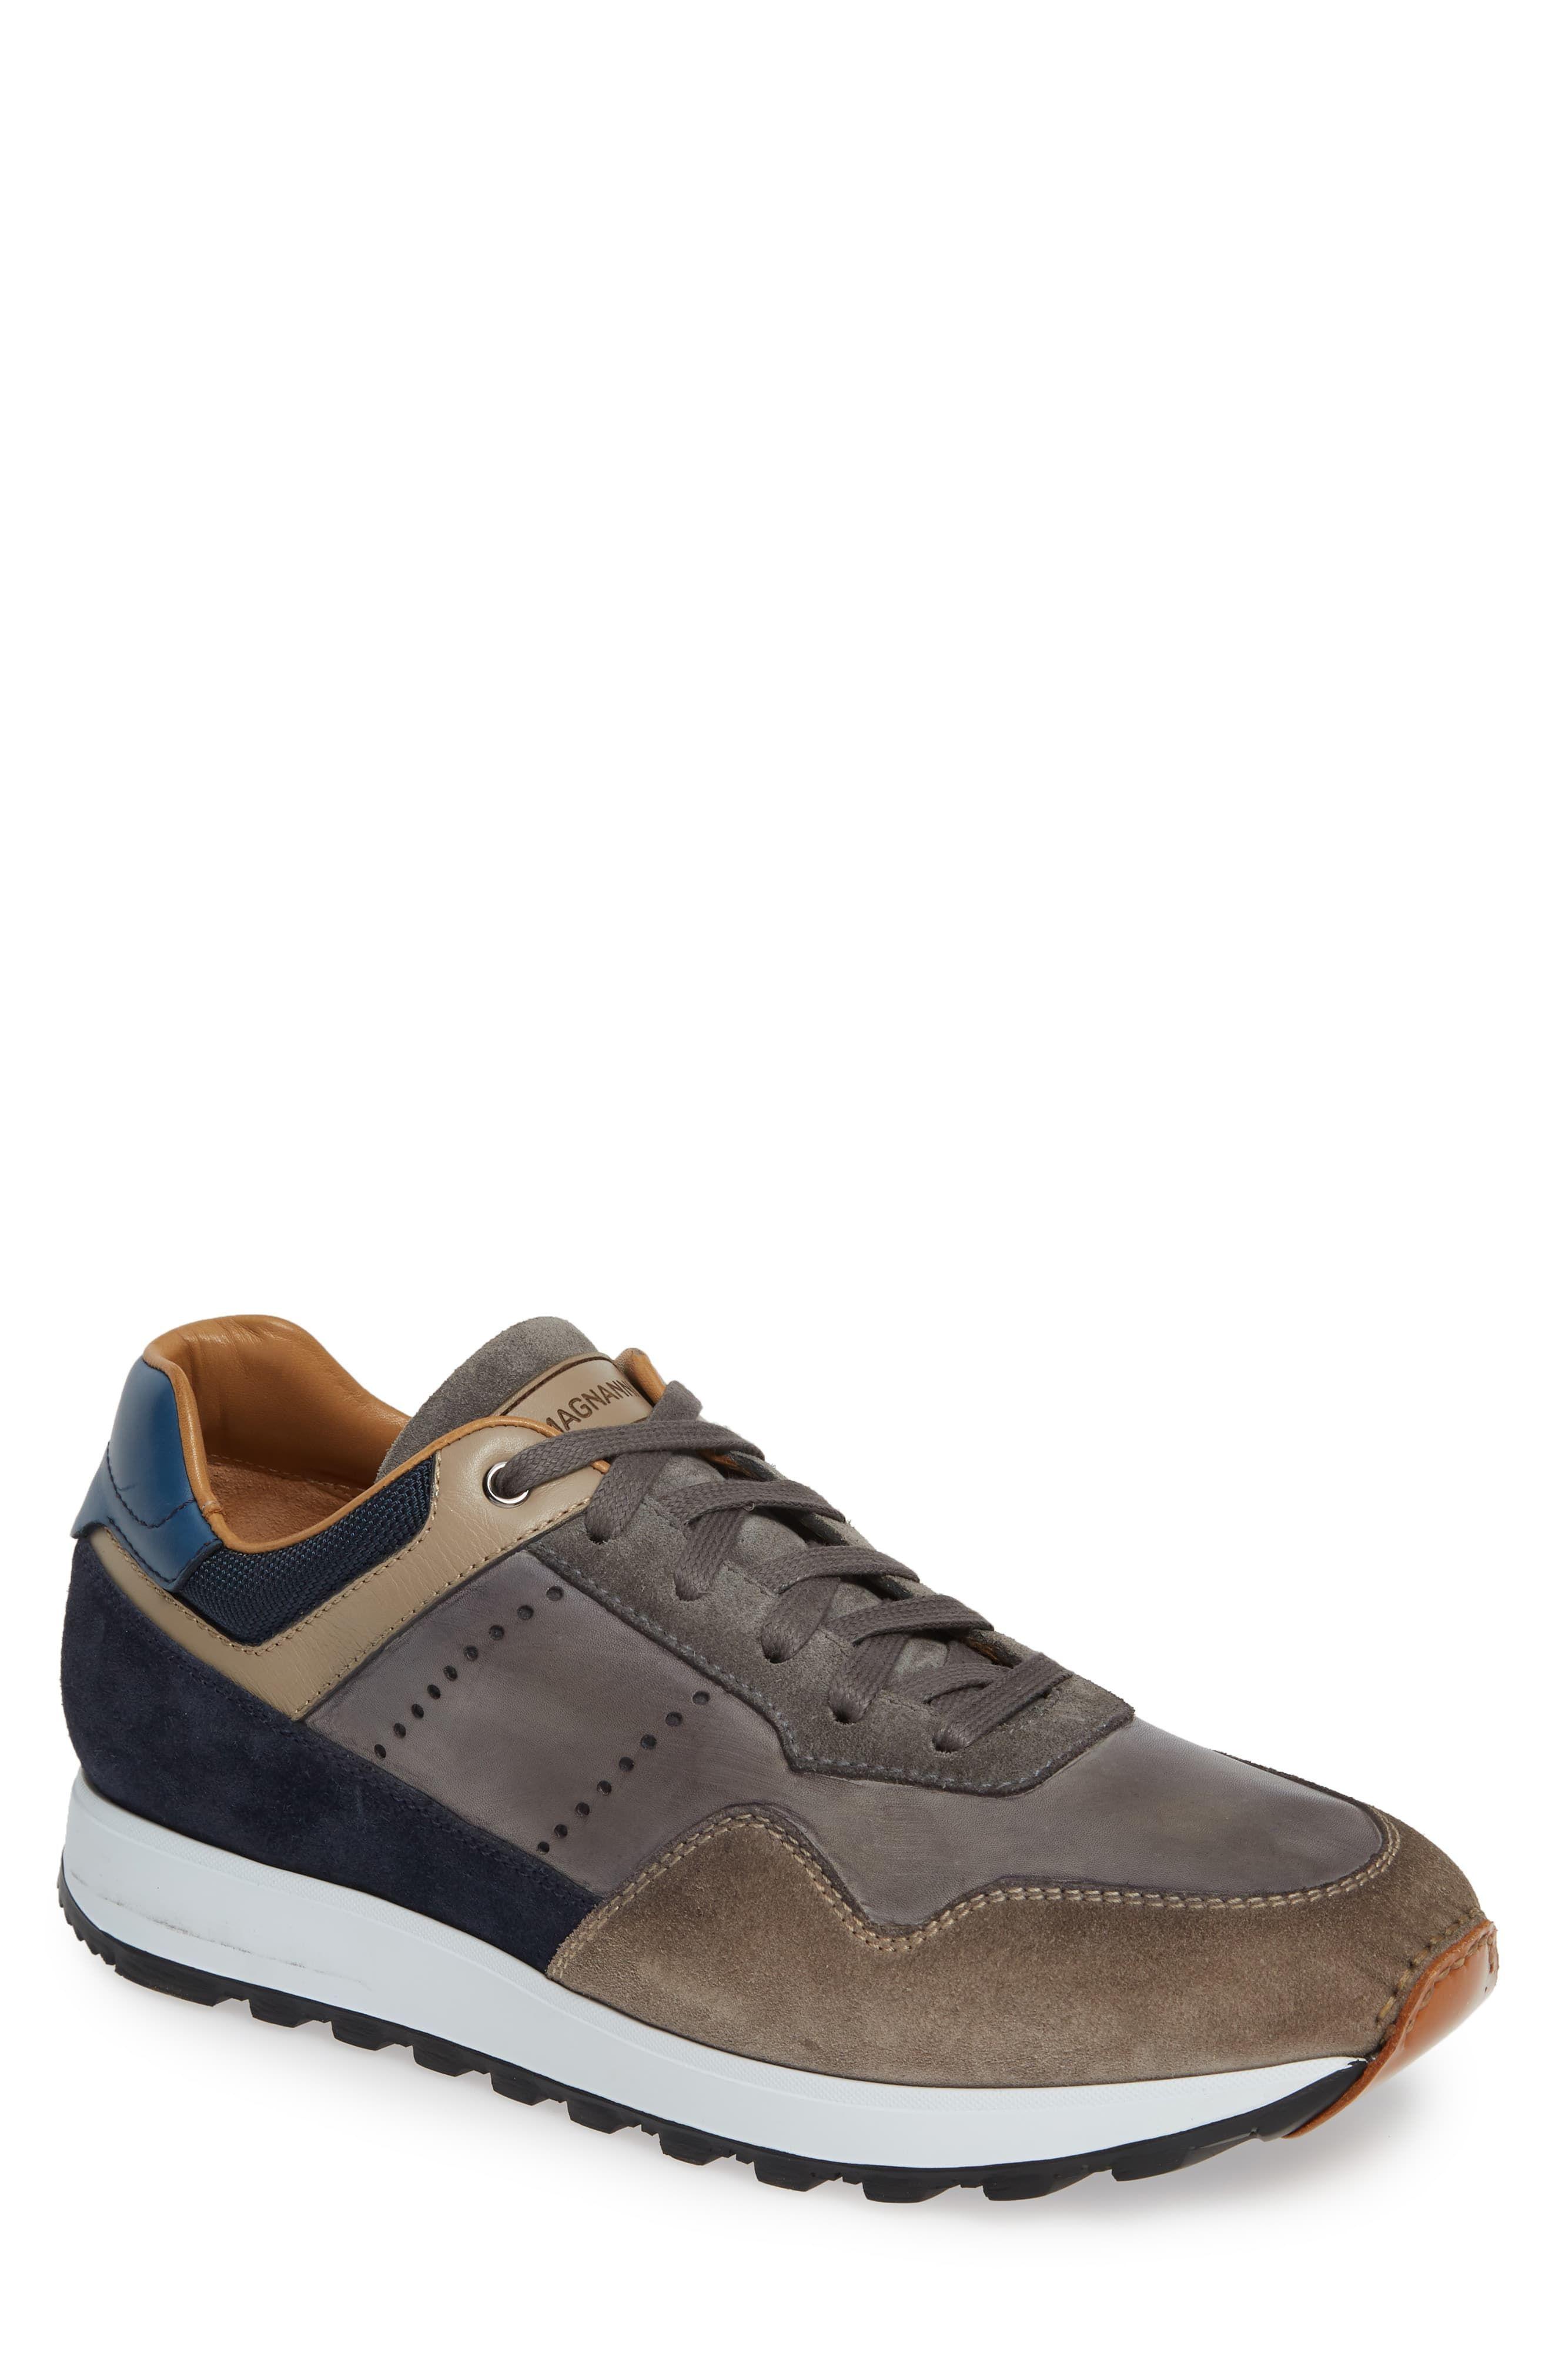 Mens Magnanni Varenna Sneaker, Size 11.5 M – Grey